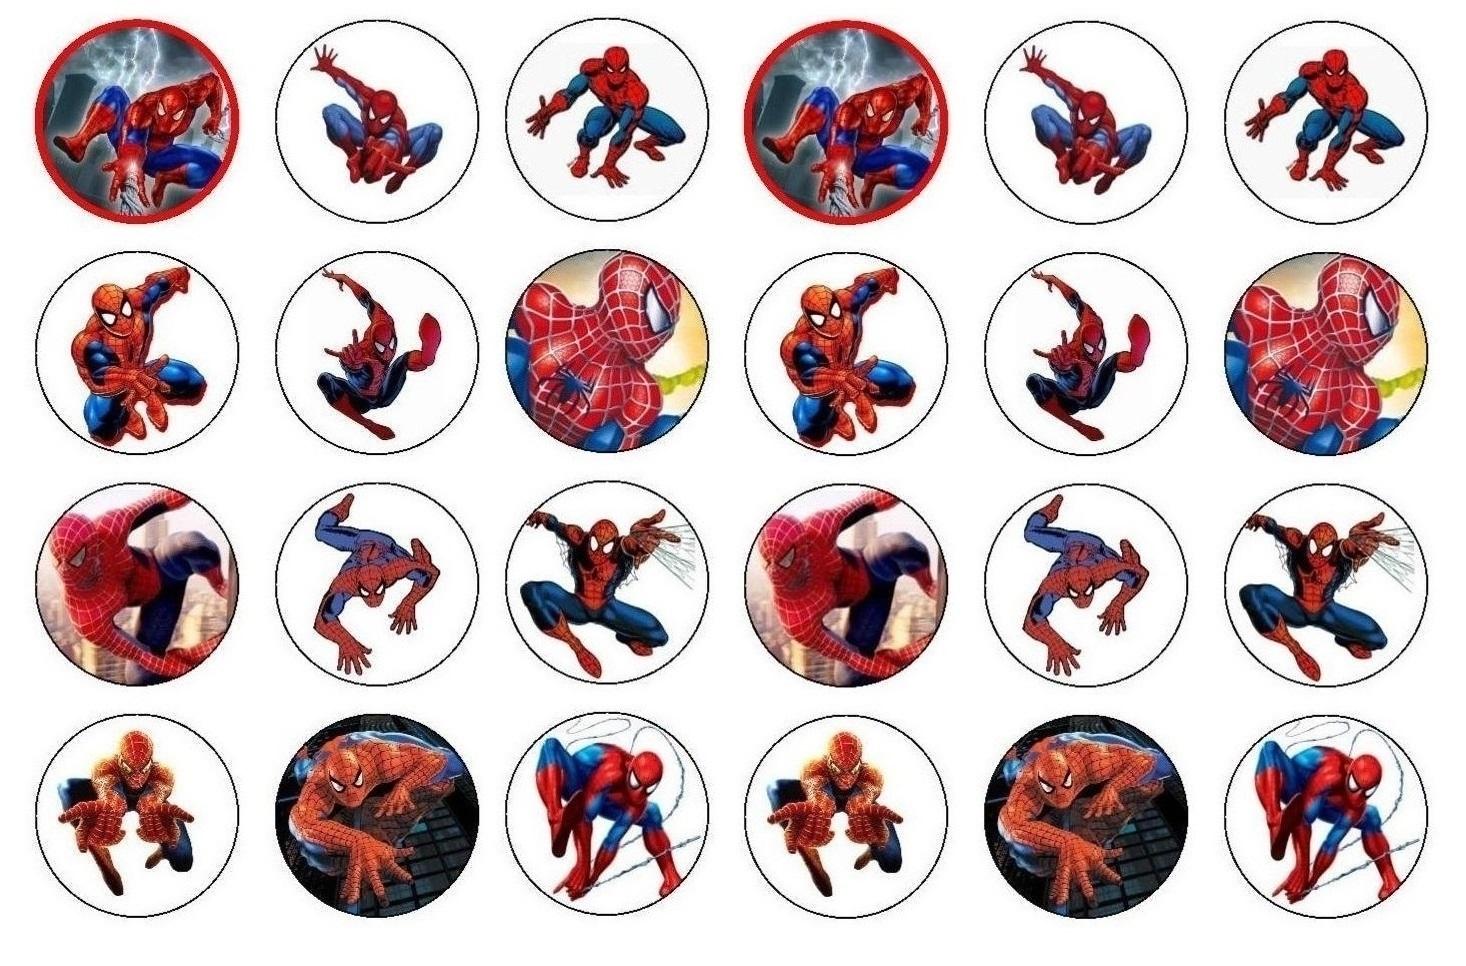 Spiderman cupcake / cookie toppersx24 per sheet ...